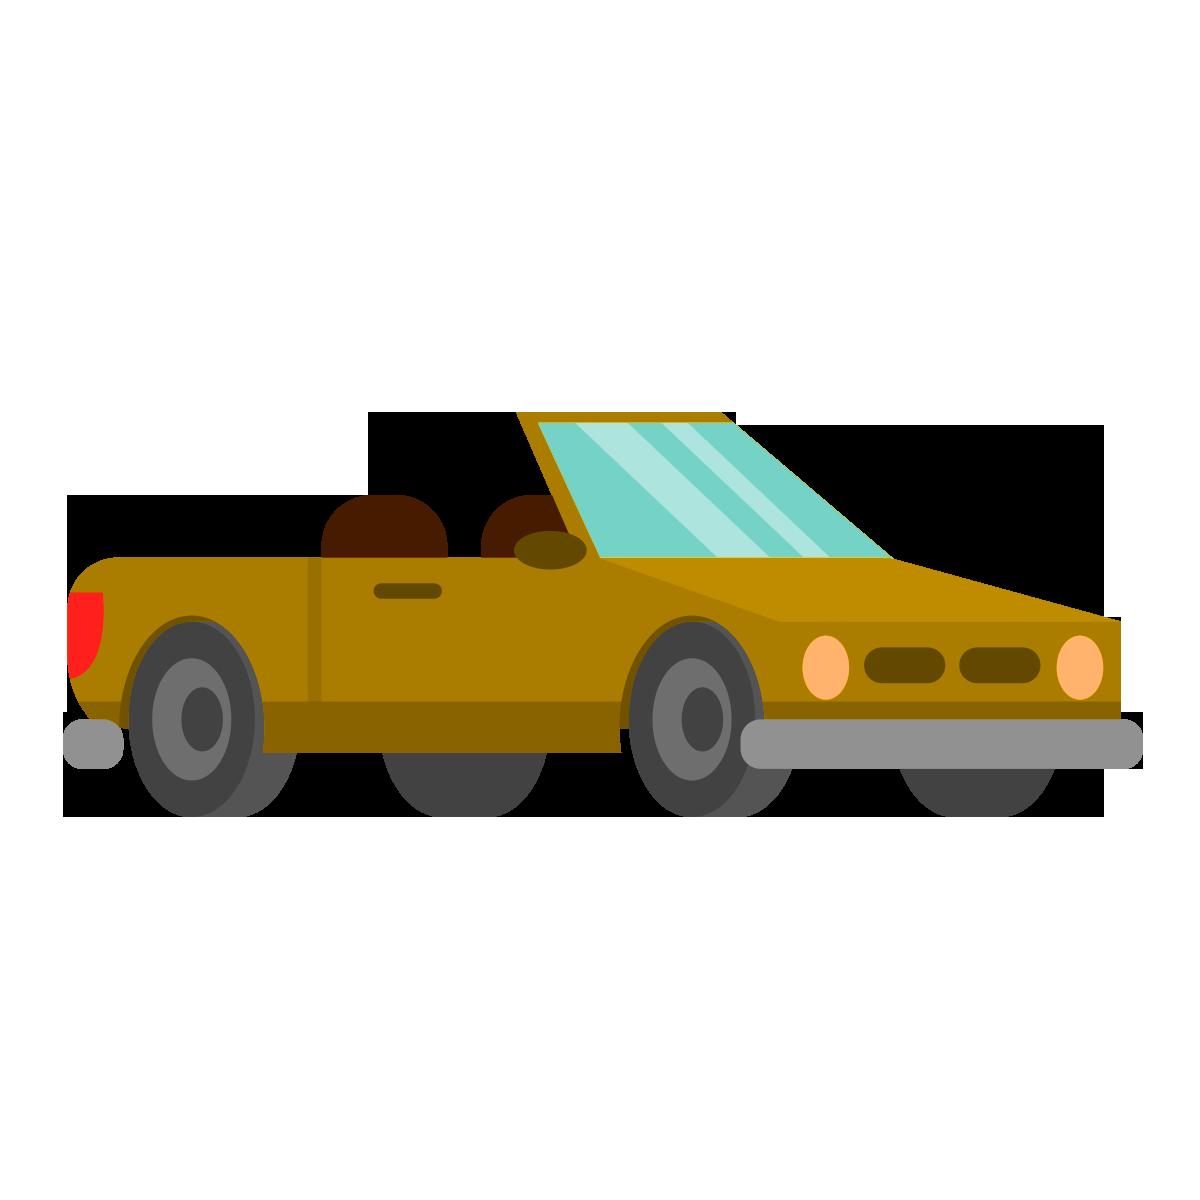 Car Transparent Image